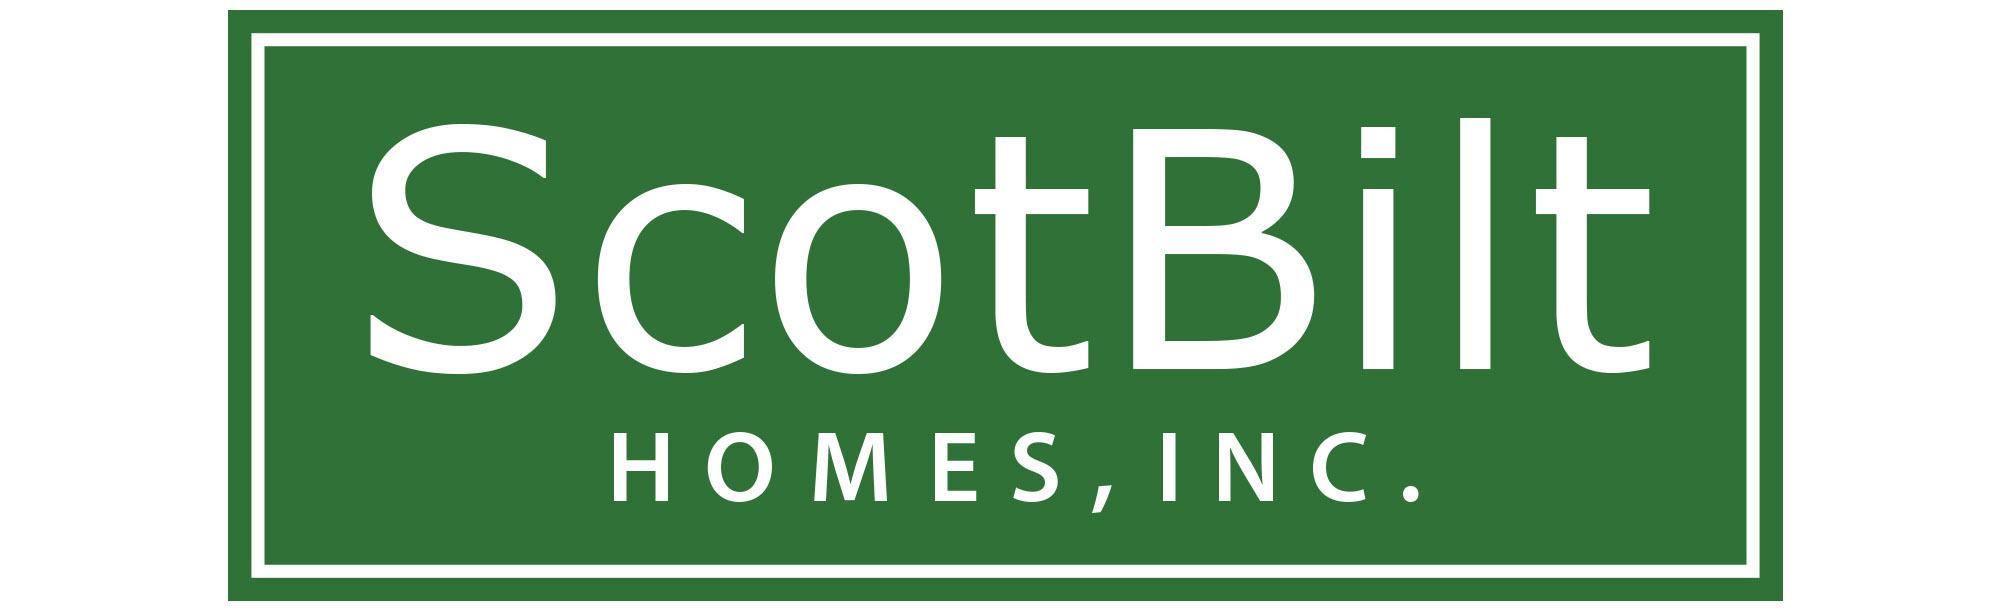 Scotbilt Homes - Ocala Custom Homes